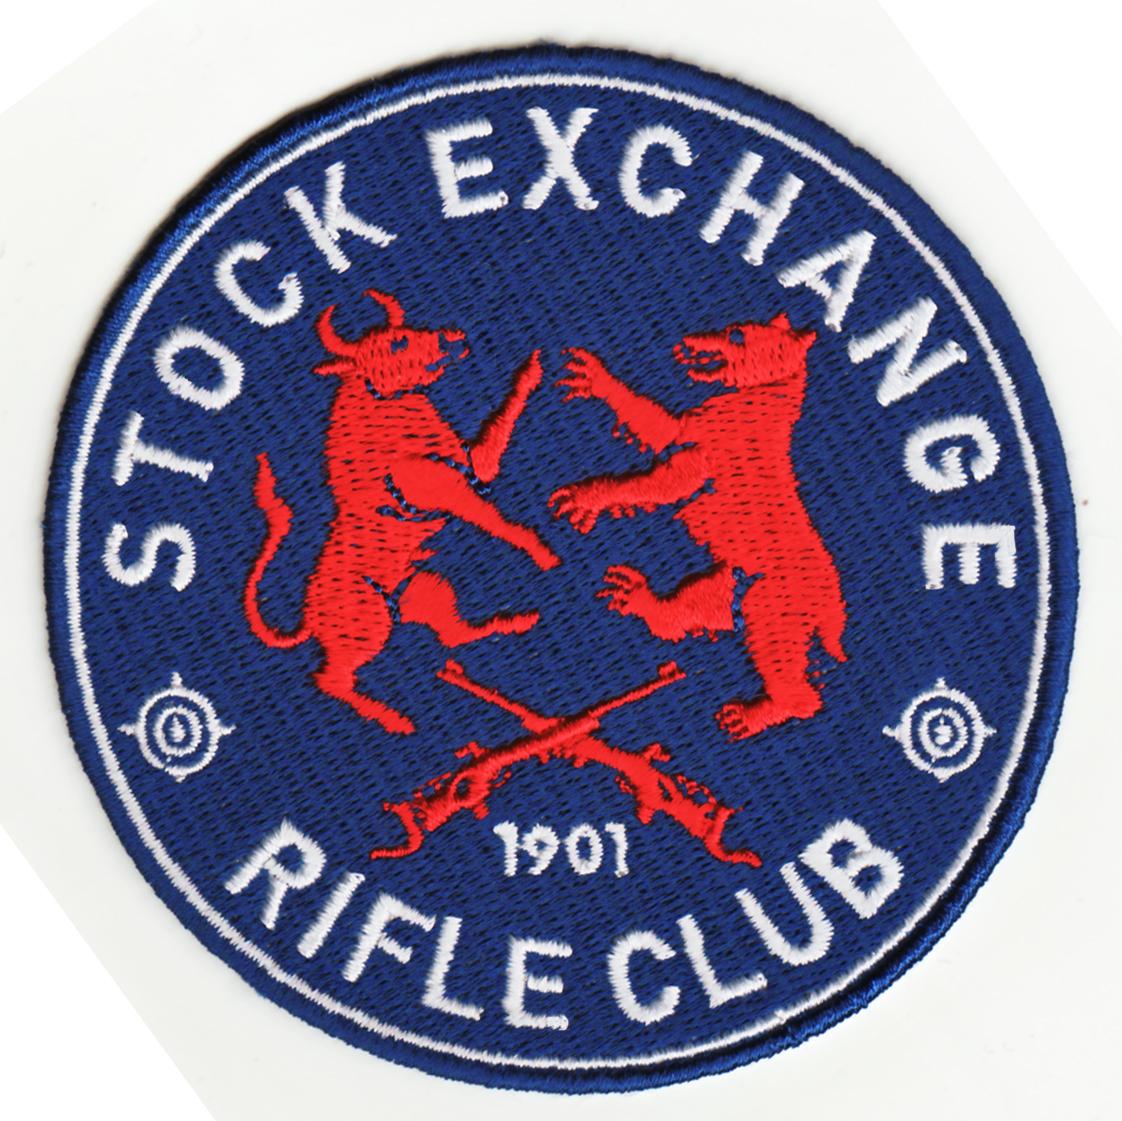 Sample of badges